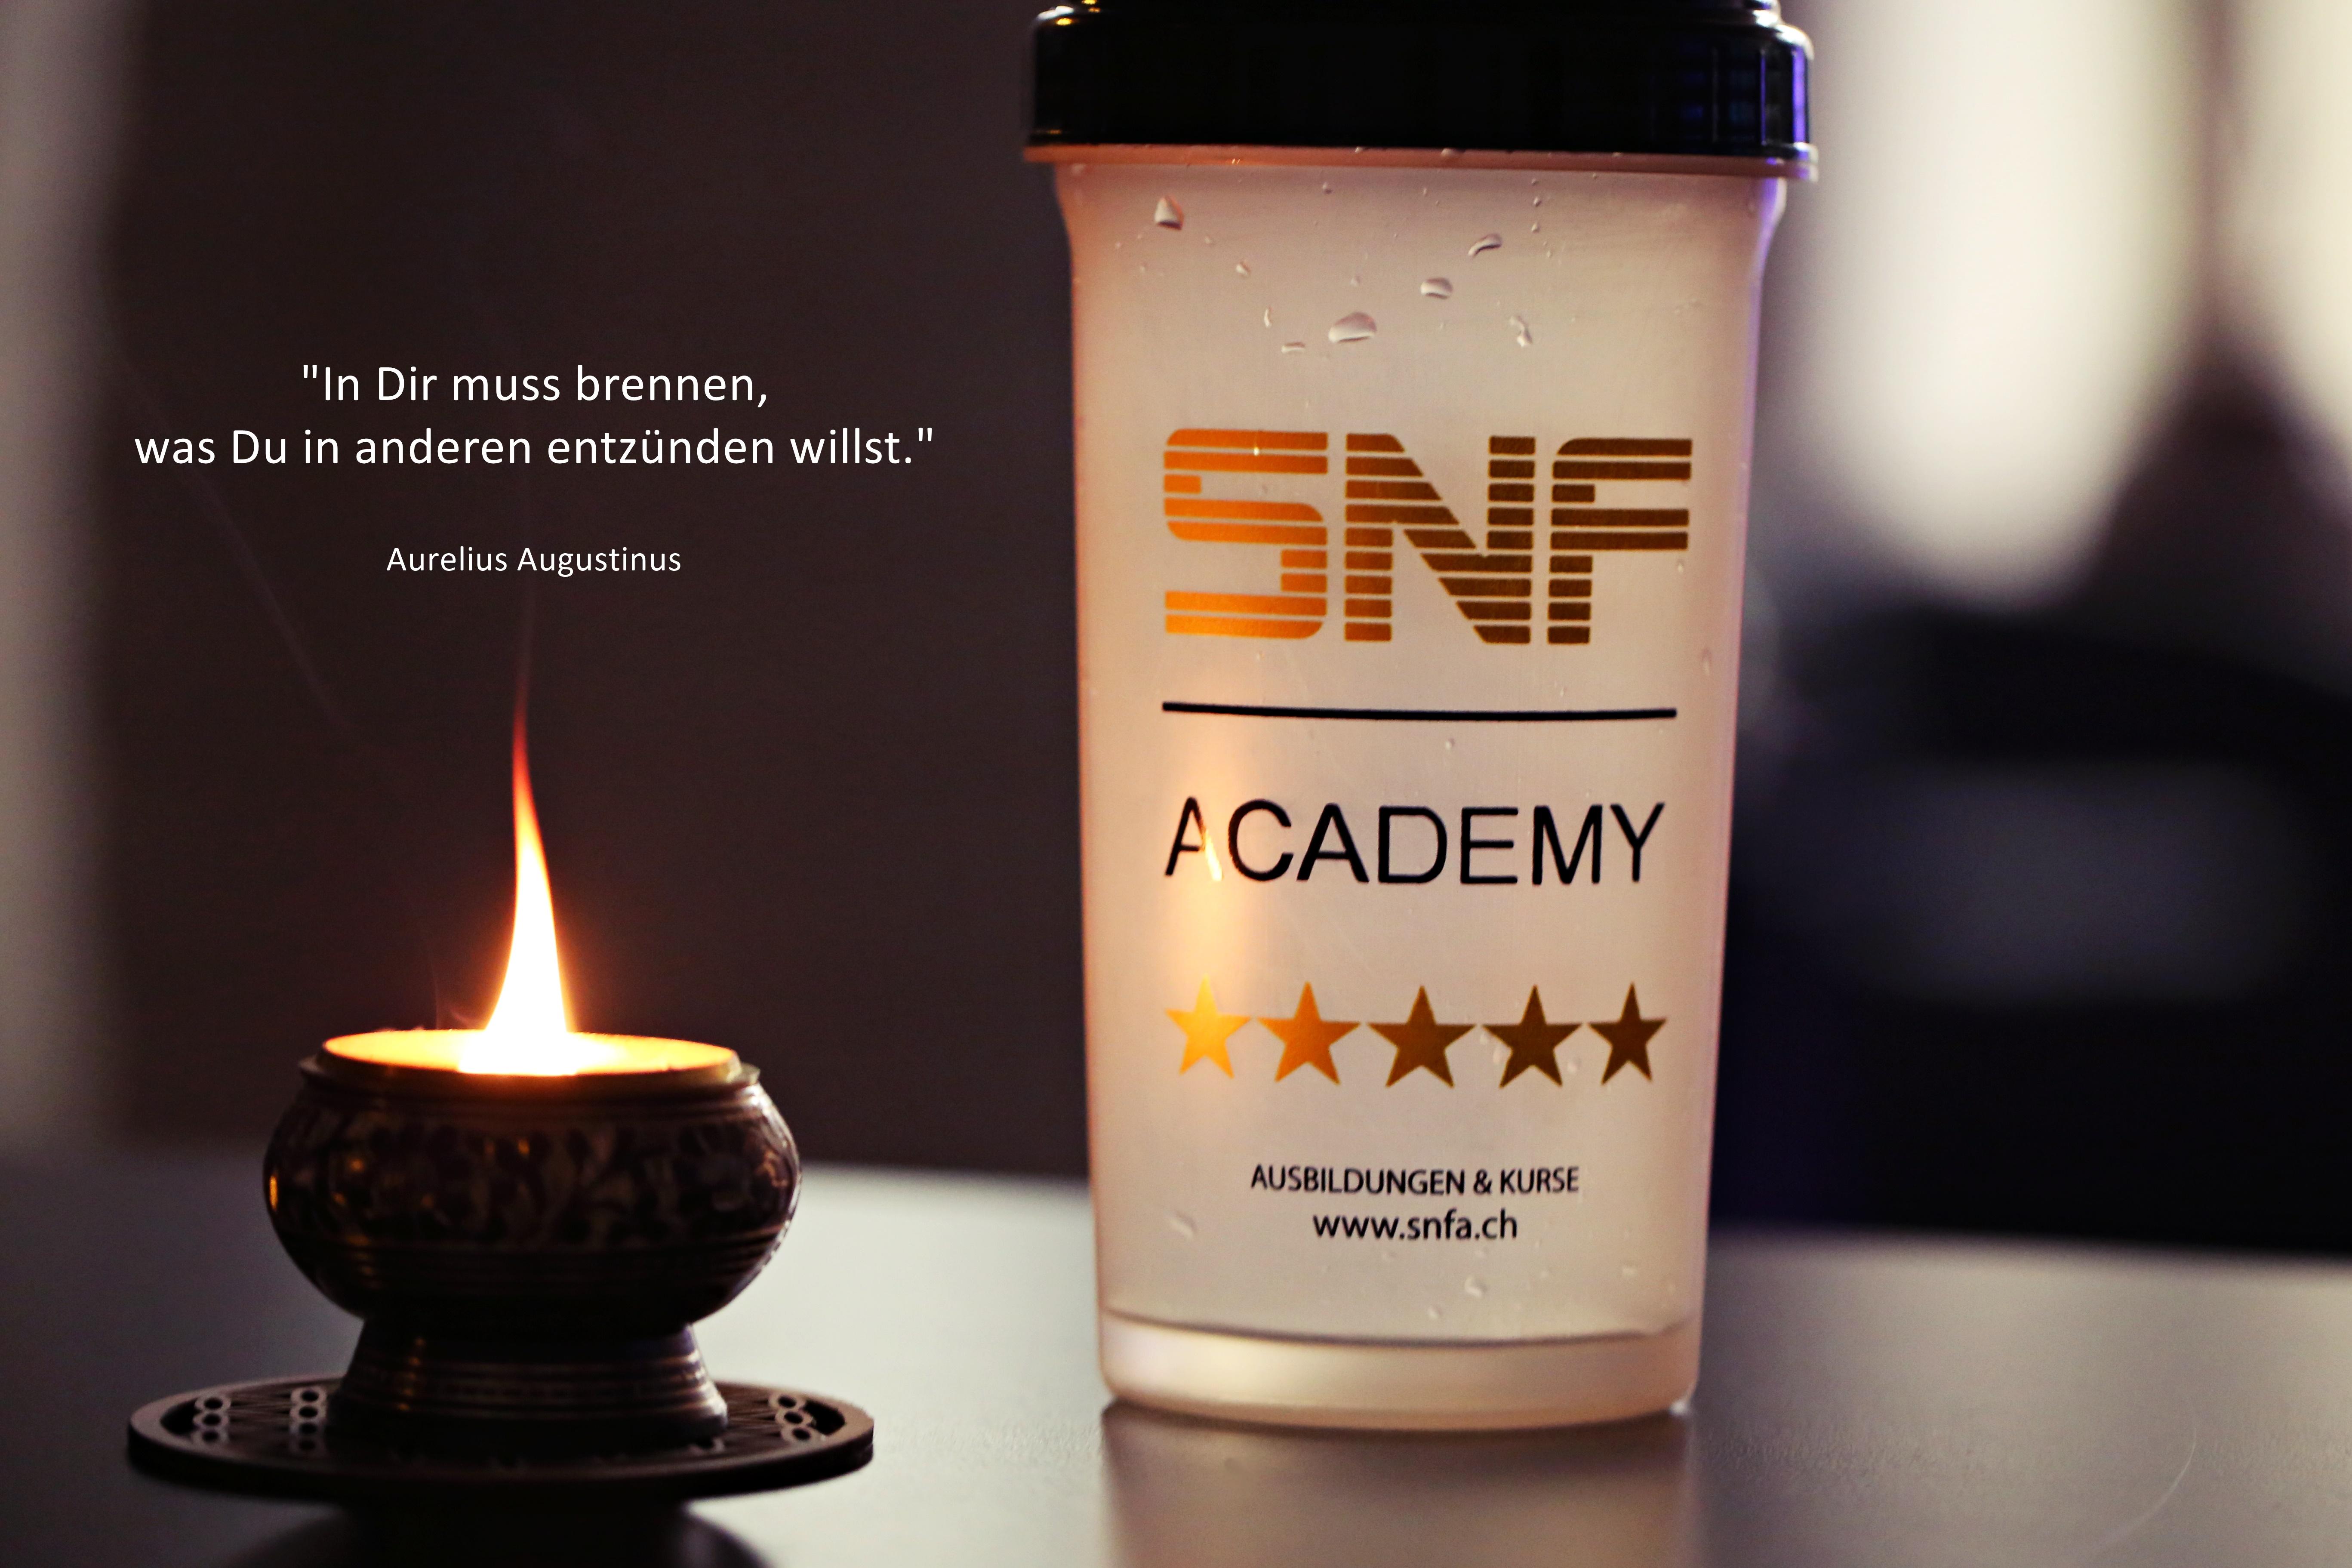 snfa academy - www.snfa.ch